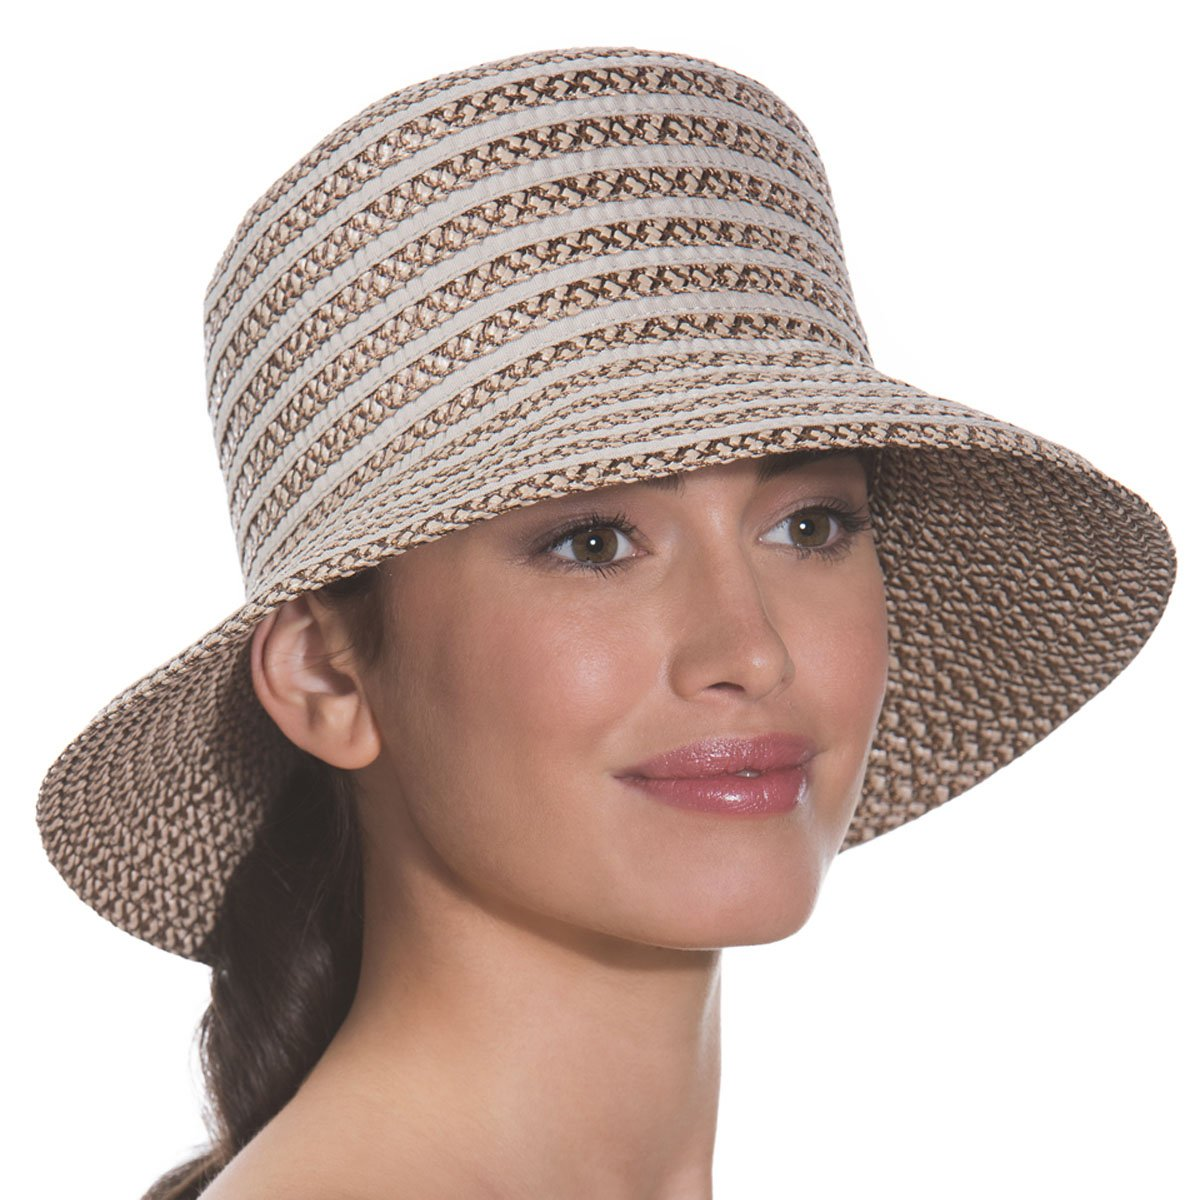 Eric Javits Luxury Fashion Designer Women's Headwear Hat - Braid Dame - Bark by Eric Javits